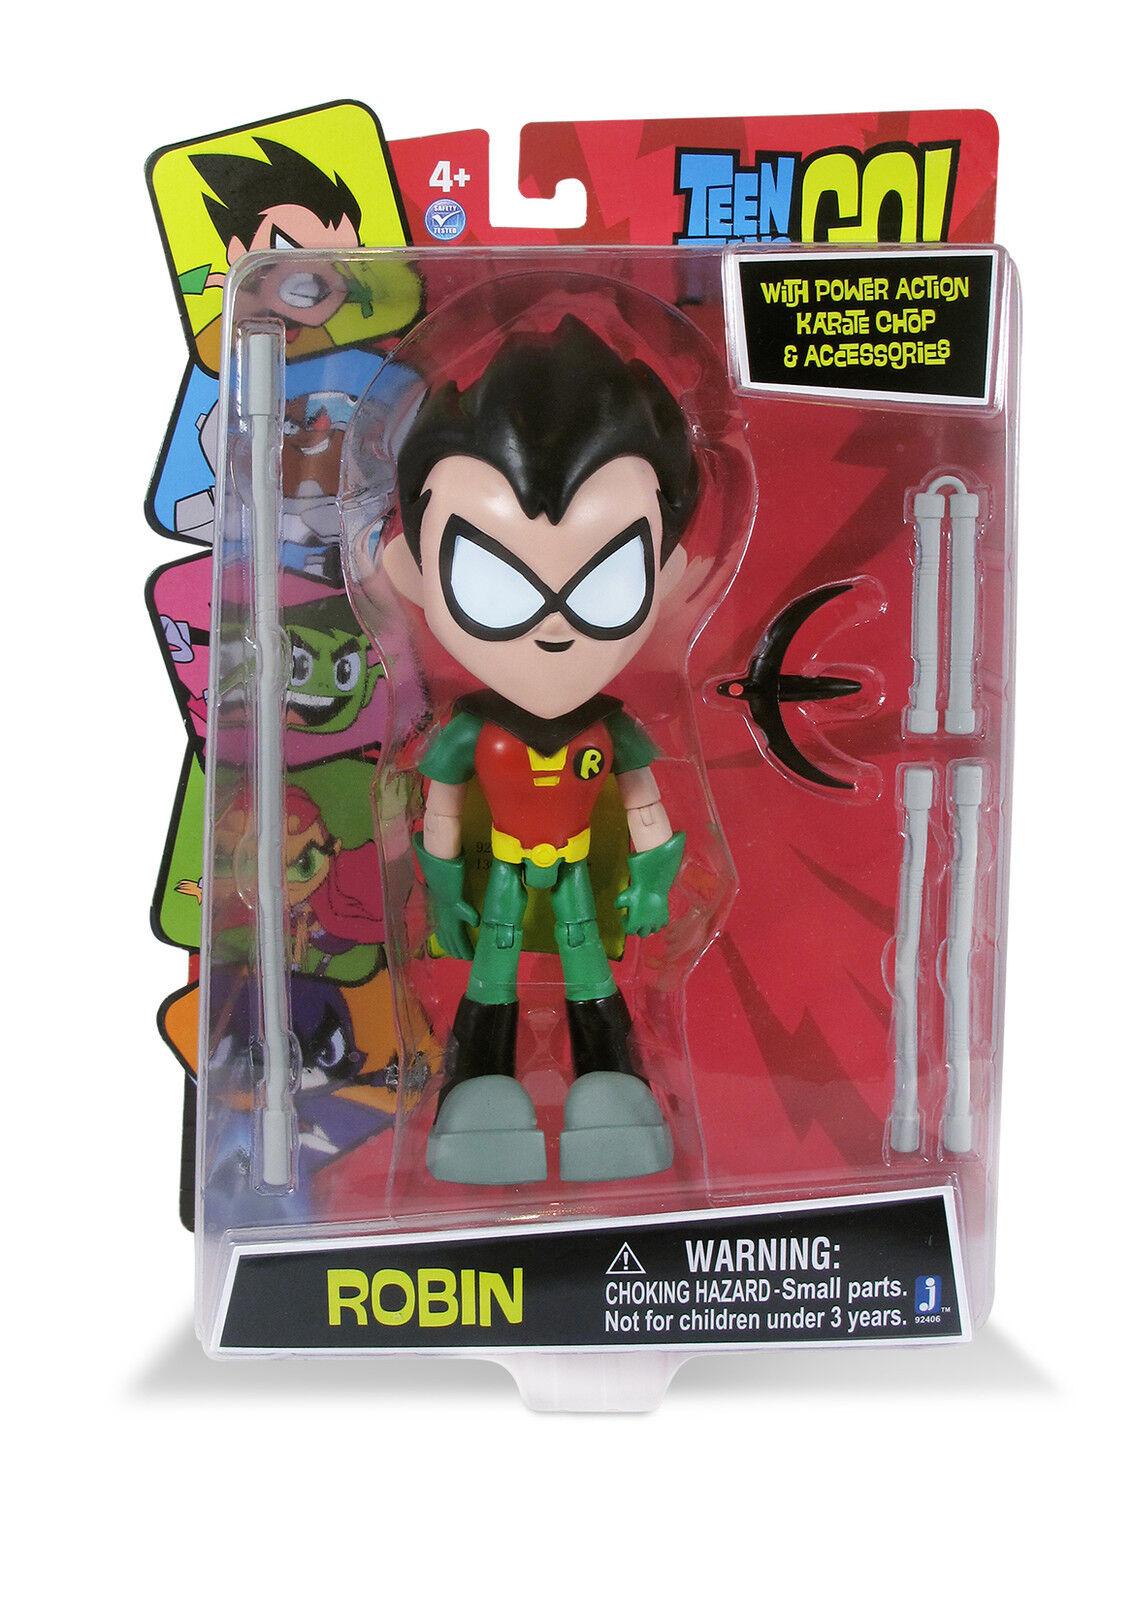 Big 8  (20cm) (20cm) (20cm) Teen Titan Robin Leader GO  Articulated Action Figure Case Of 4 9f716c